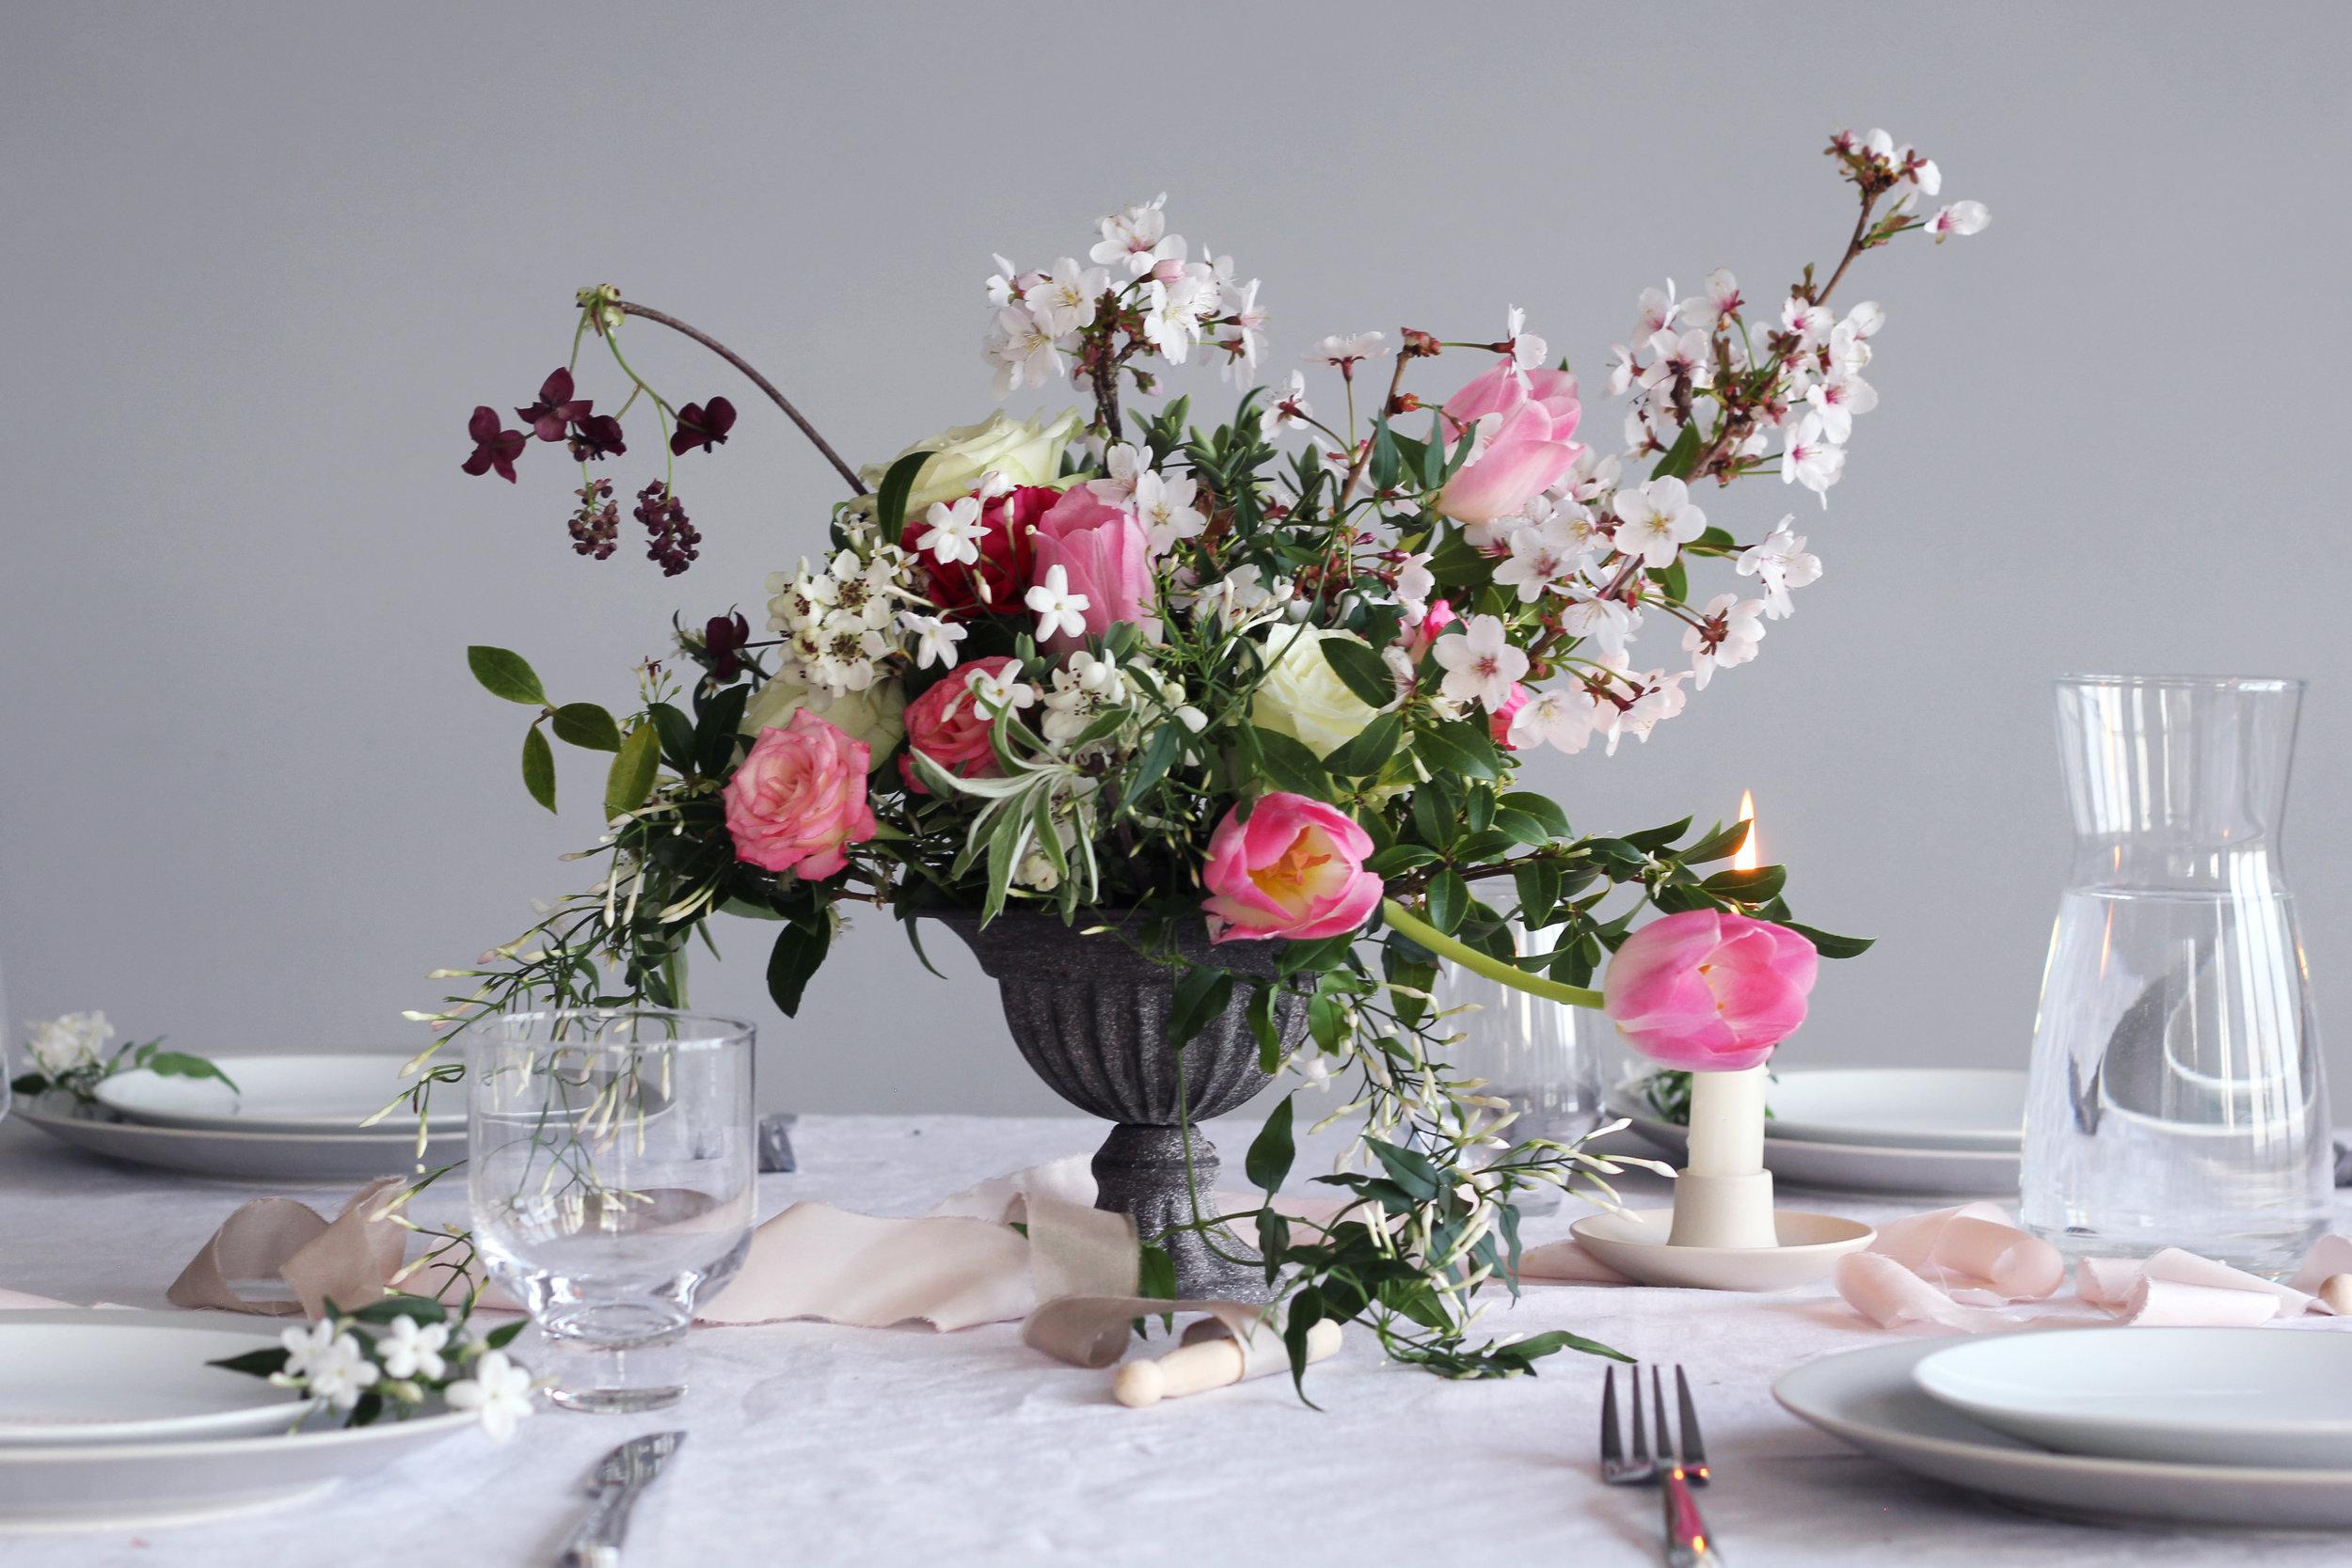 Callie-Pettigrew-Springtime-Wedding-12.jpg